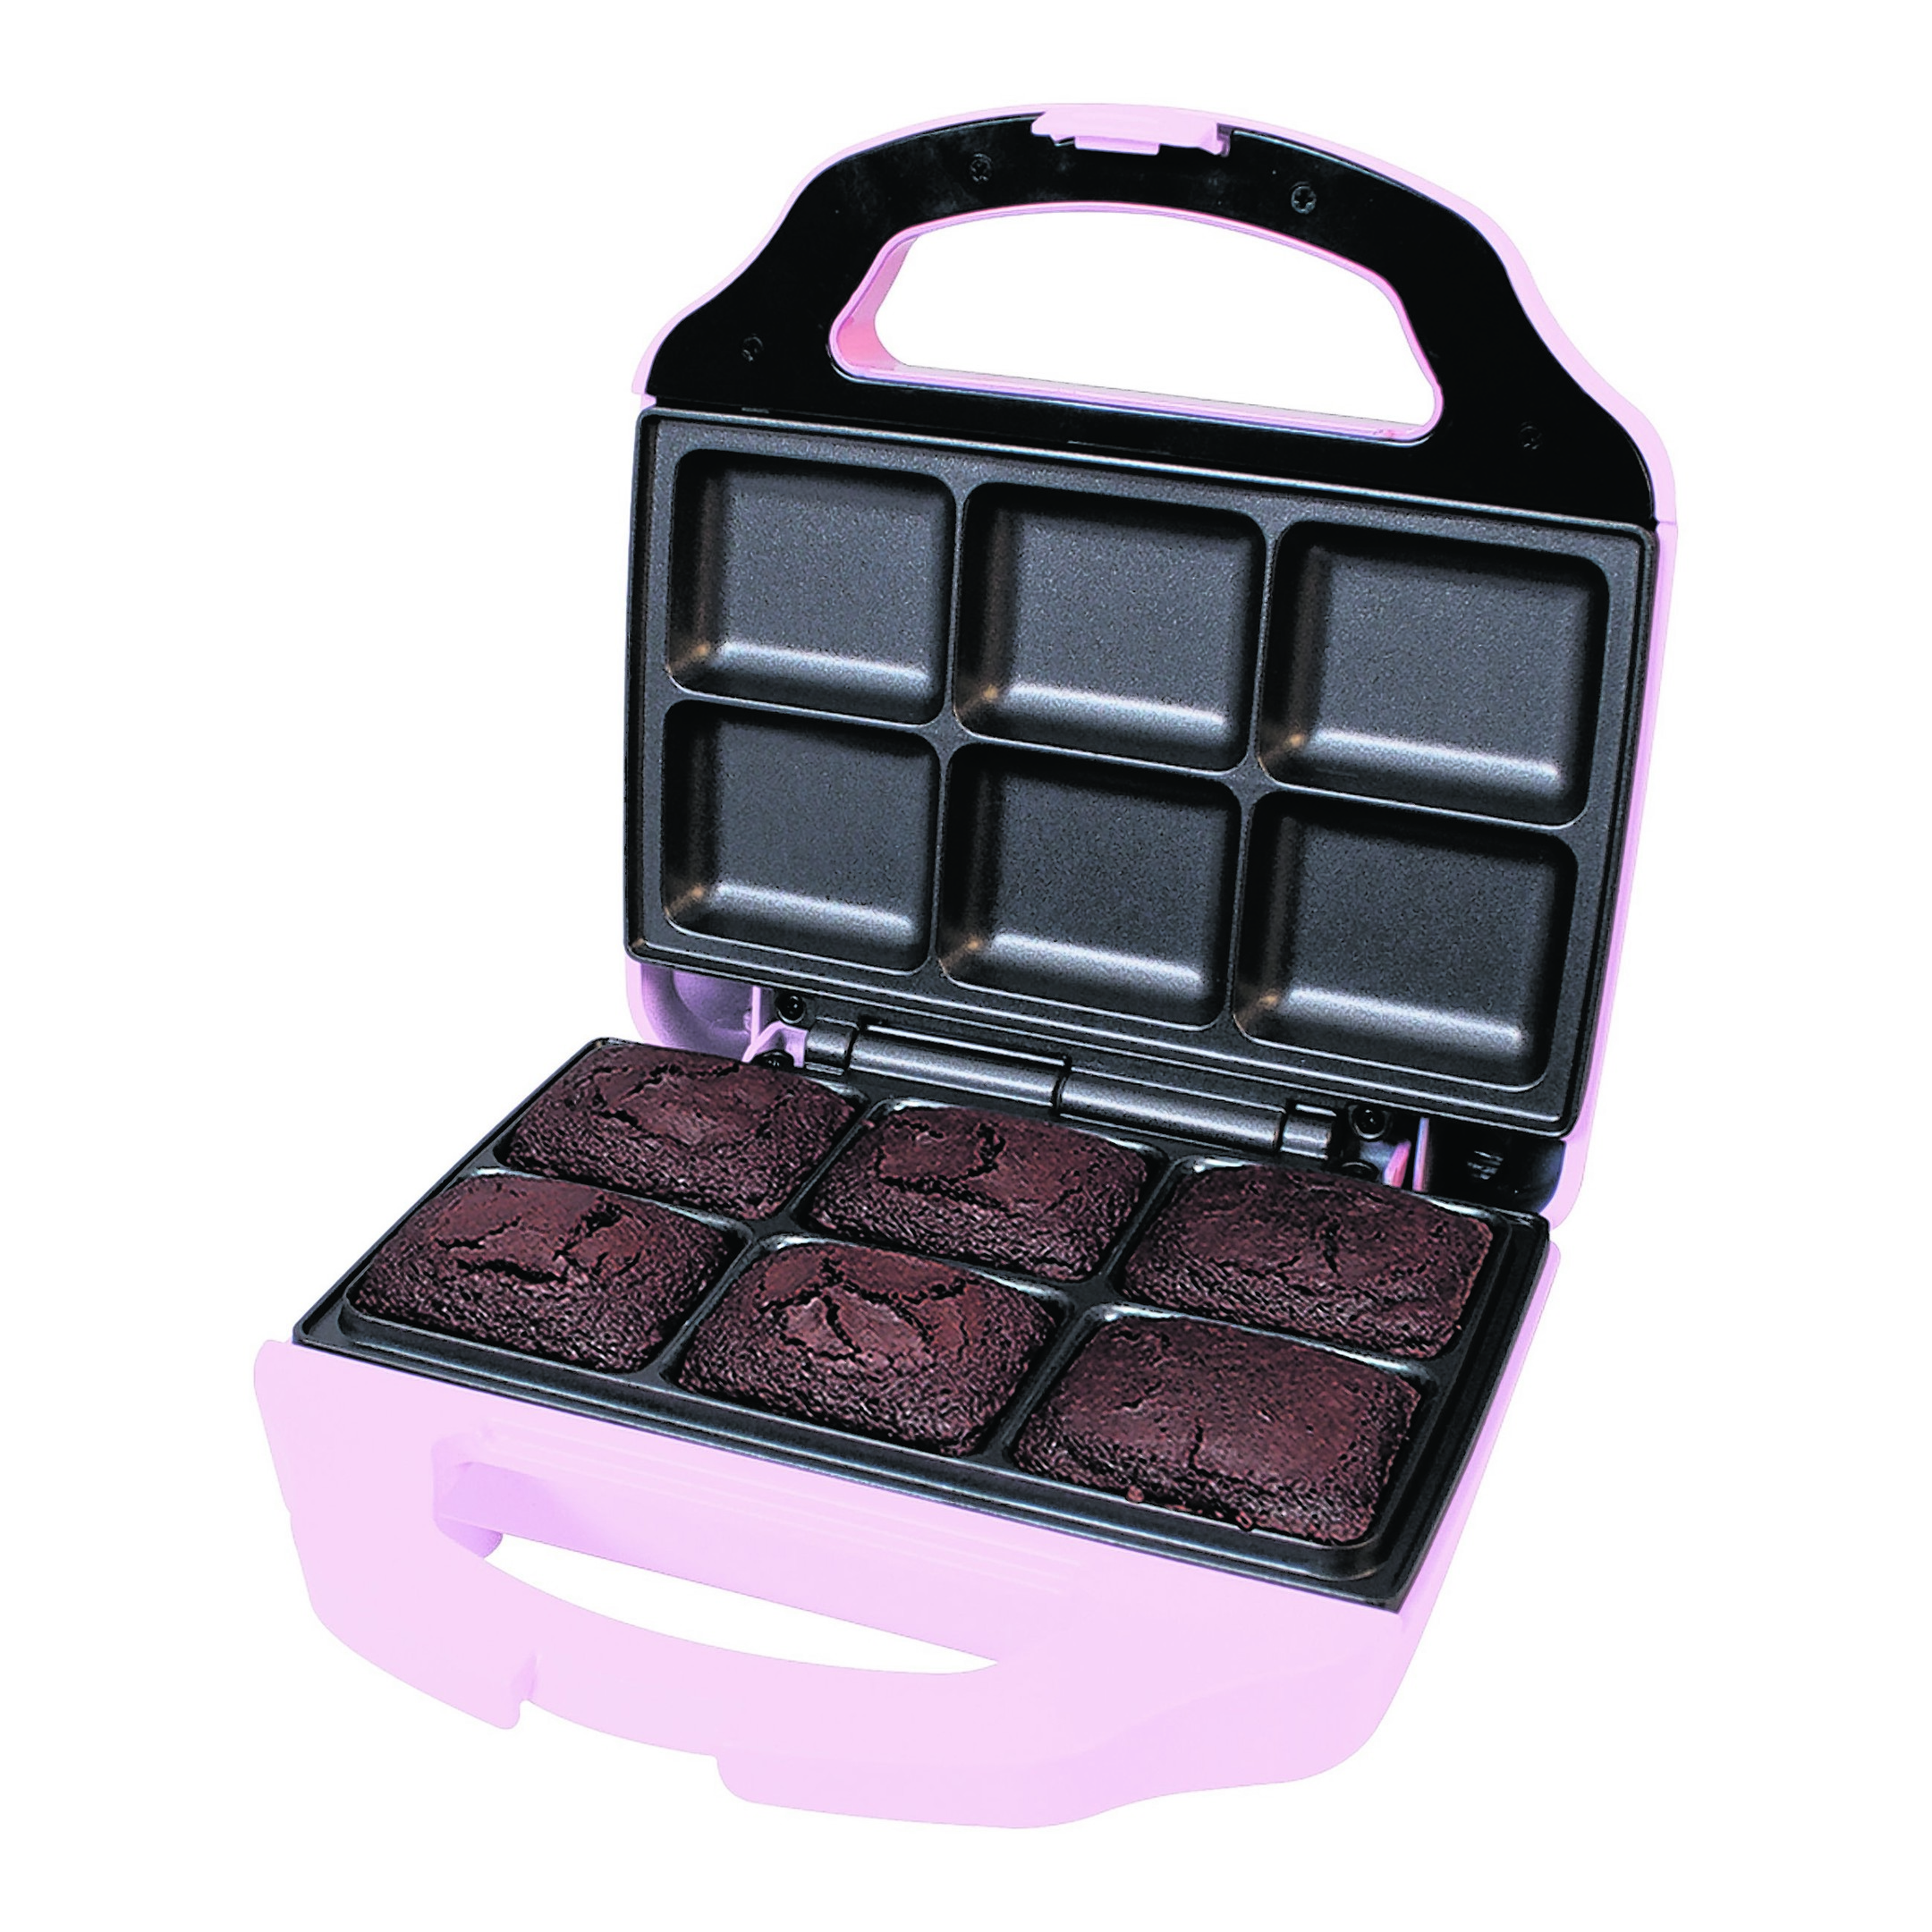 GADGETS Chocolate 092194